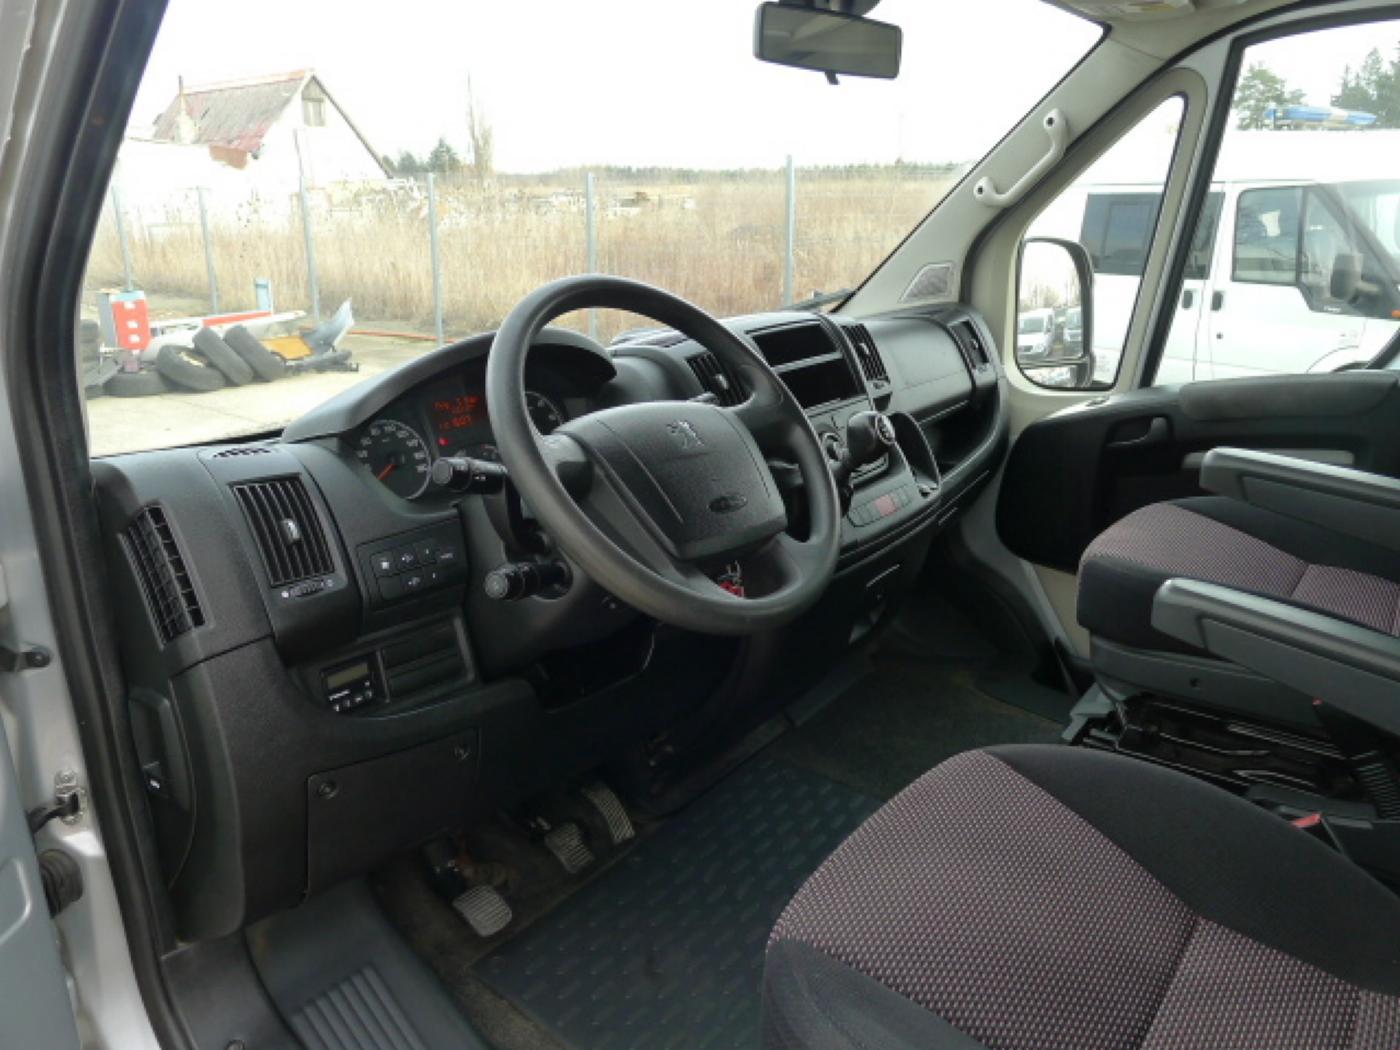 Peugeot Boxer 2,2 HDI PANORAMA 8míst+2 x klima+We - 9